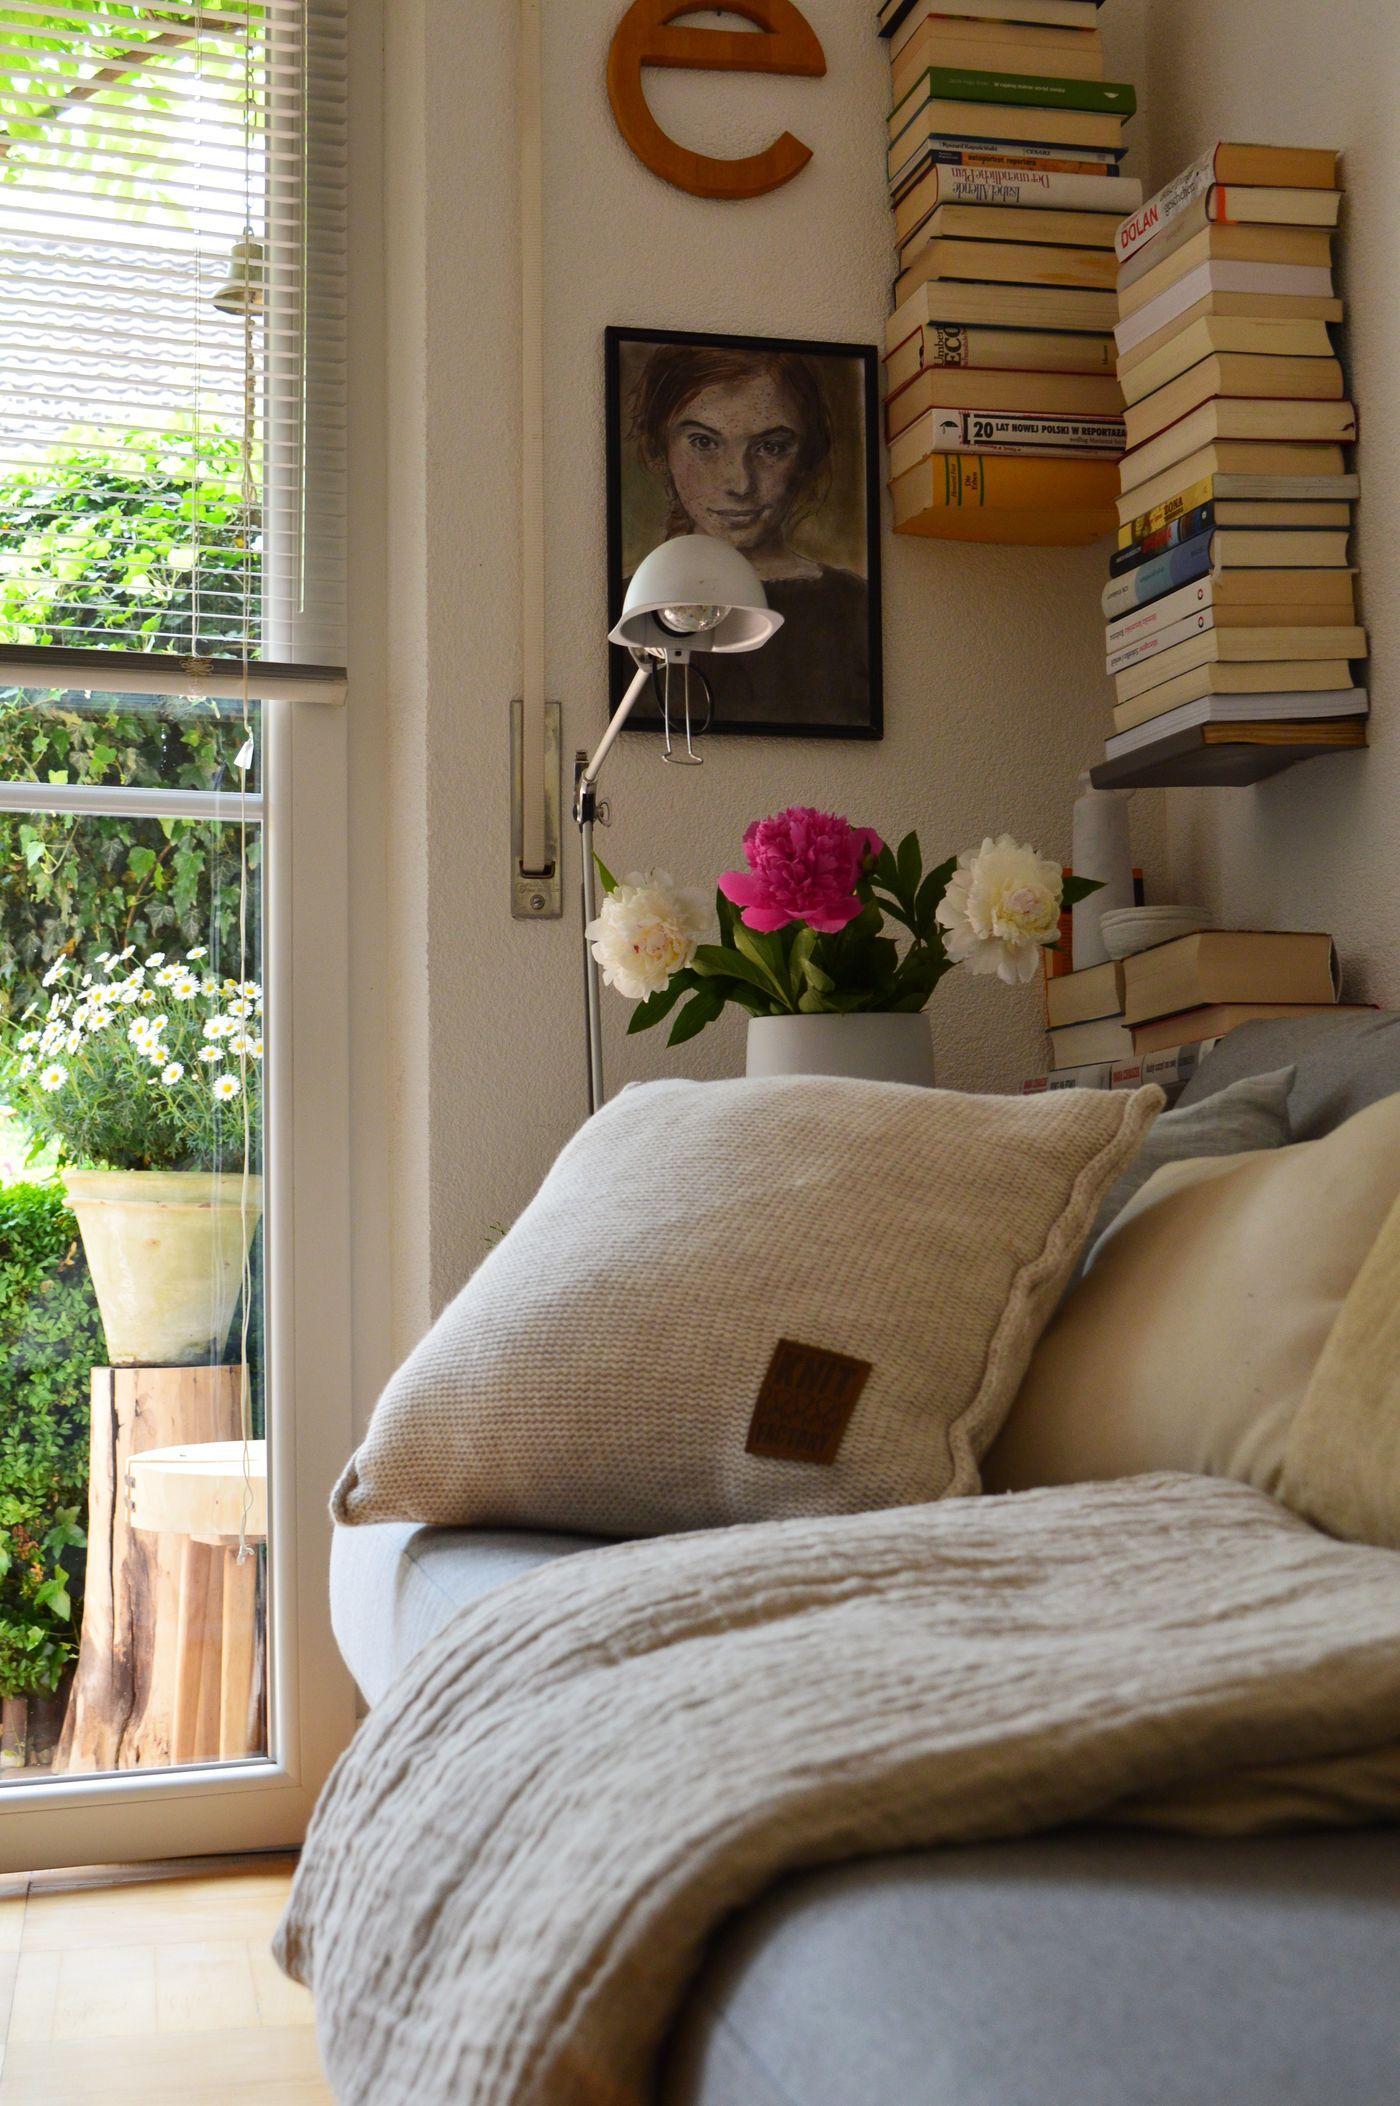 do it yourself ideen f r dein zuhause seite 15. Black Bedroom Furniture Sets. Home Design Ideas